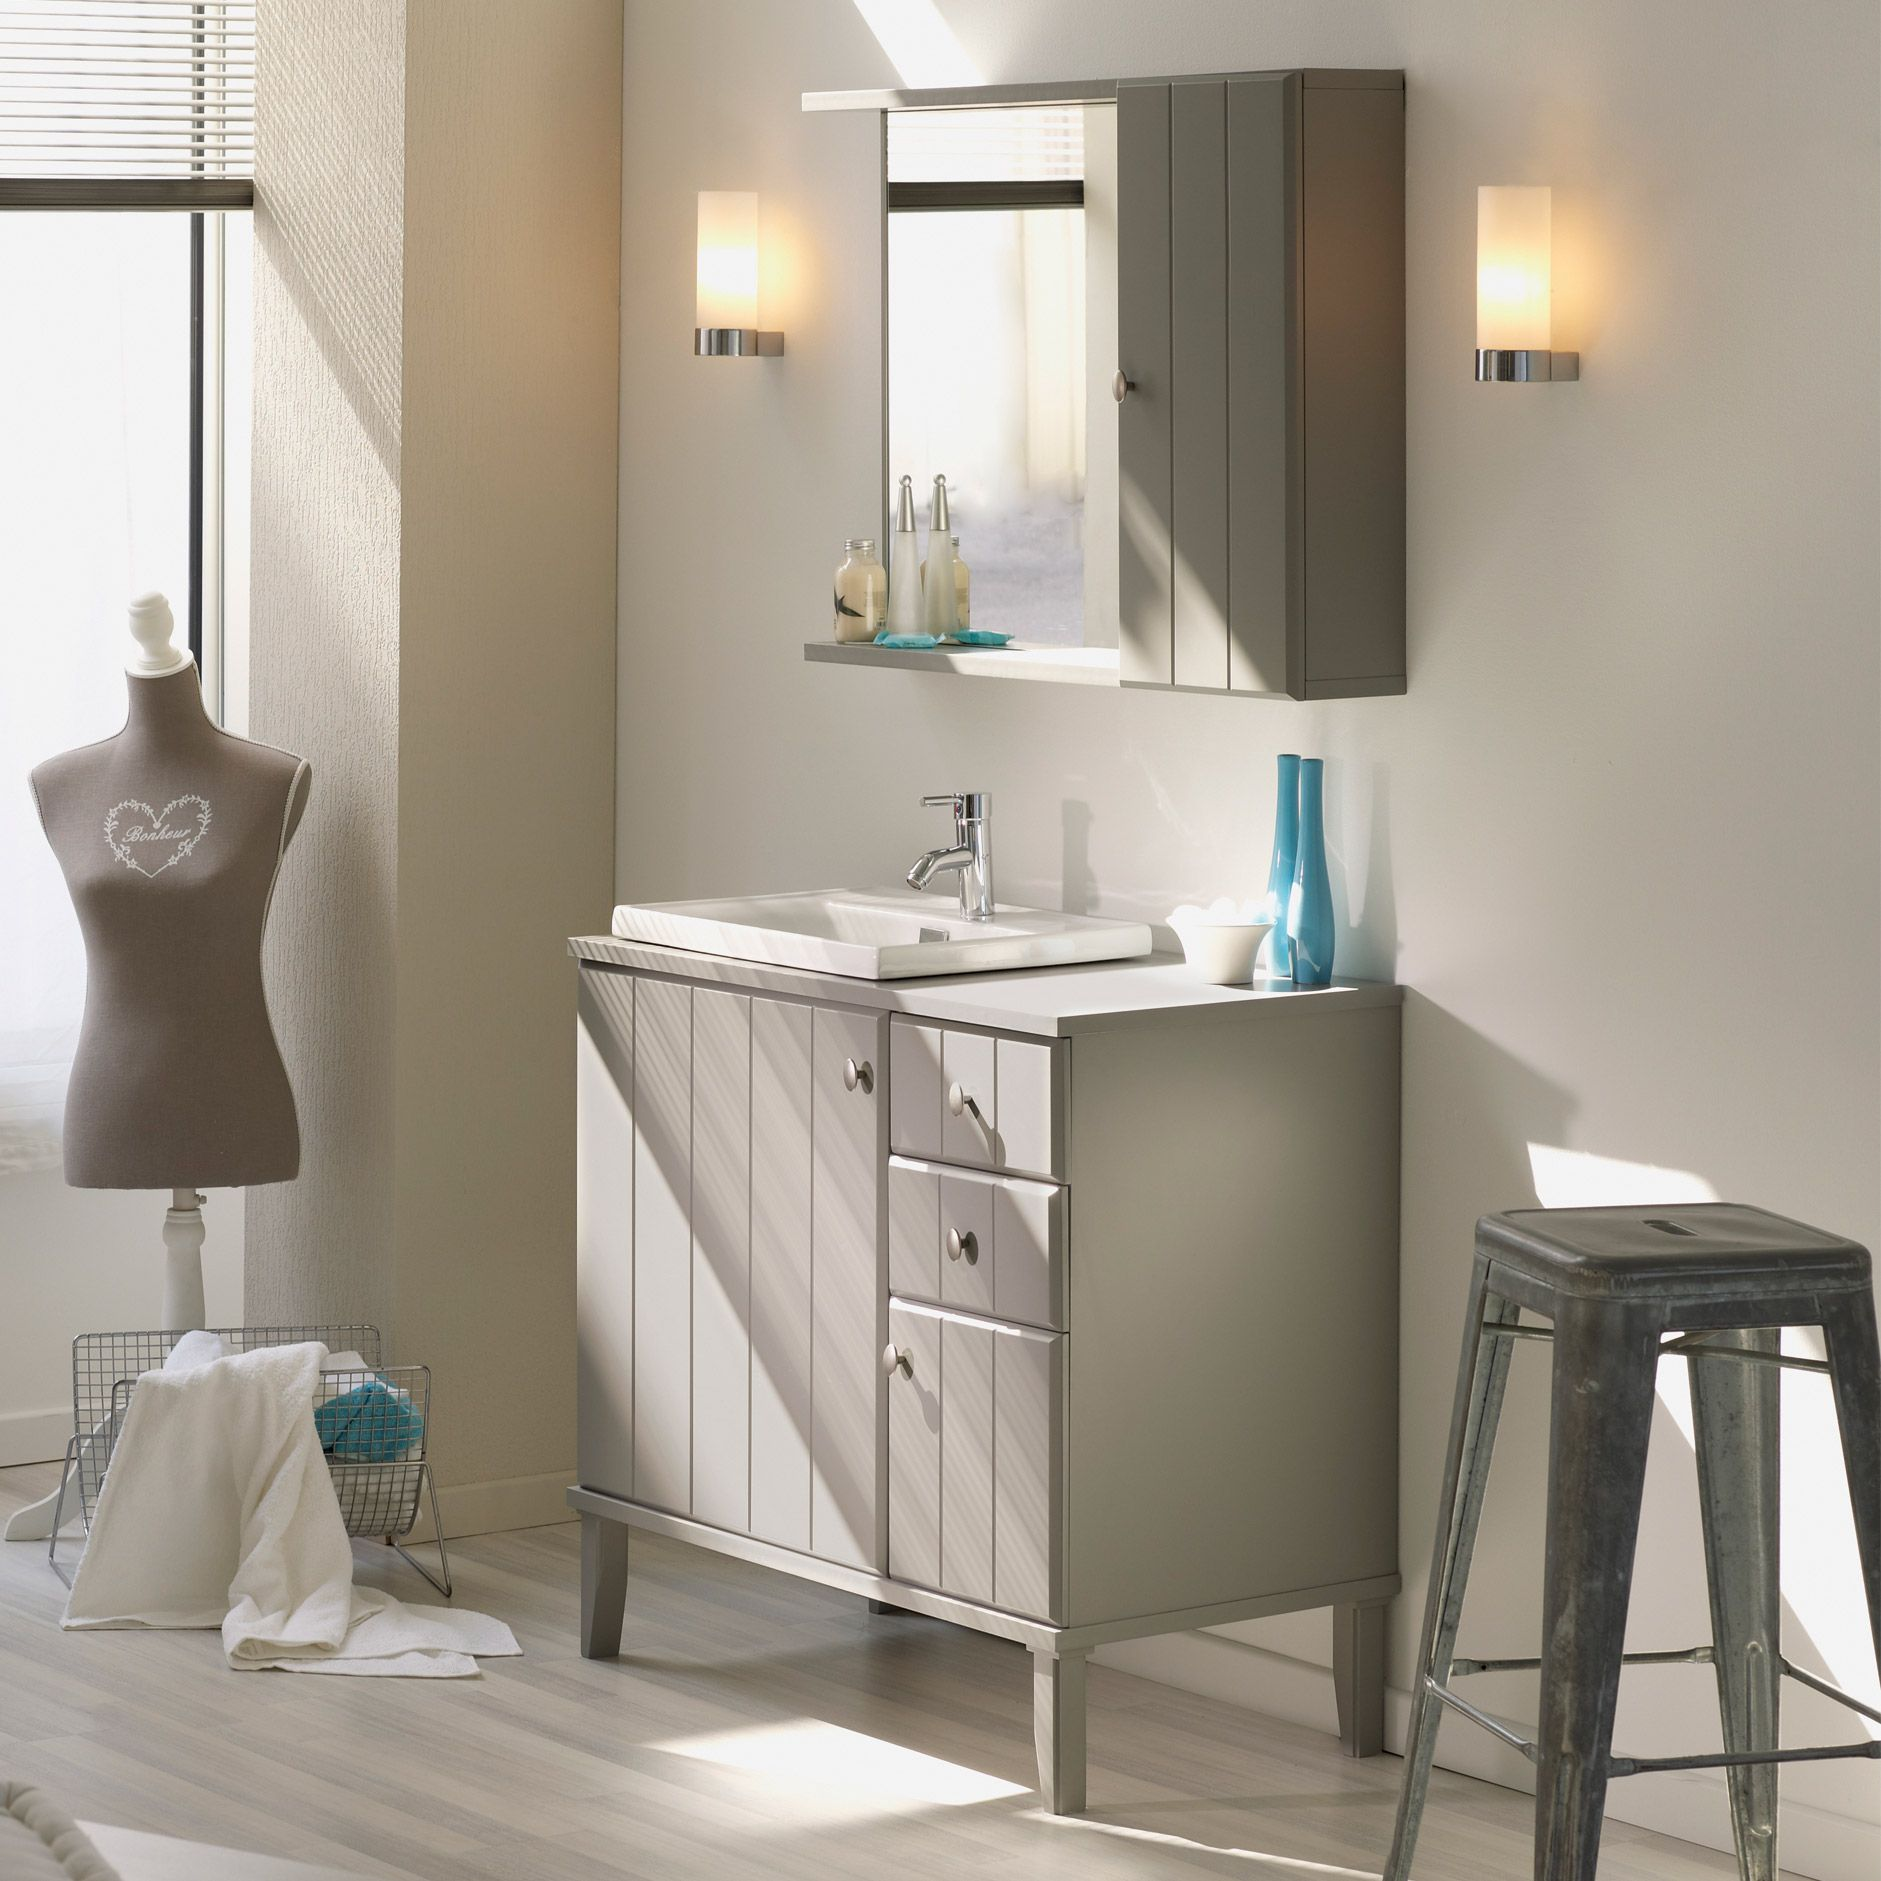 Meuble vasque 2 portes 2 tiroirs armoire de toilette